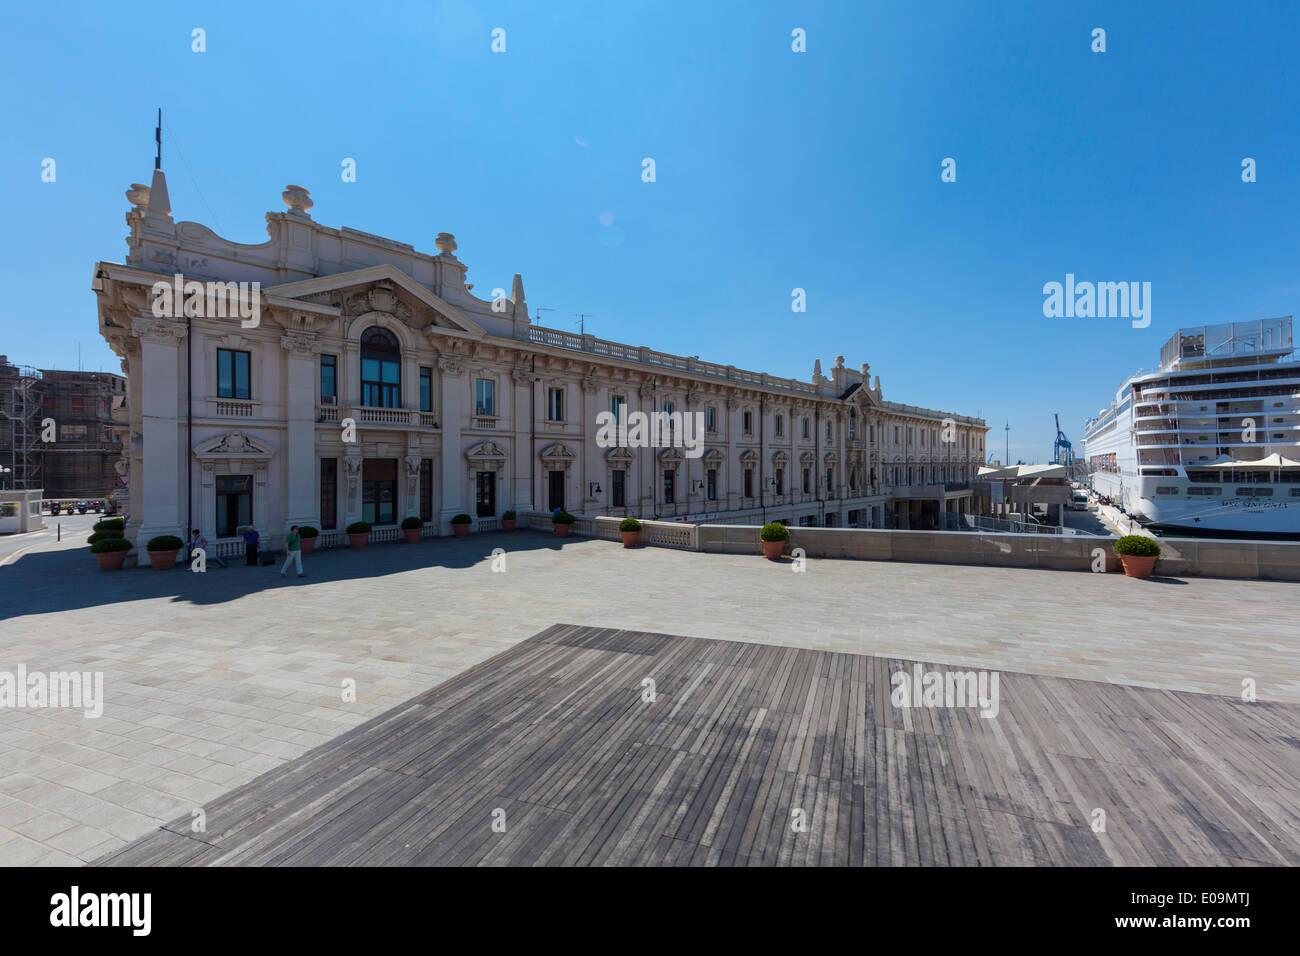 Italy, Liguria, Genoa, Stazione Marittima, Via Marinai D'Italia - Stock Image